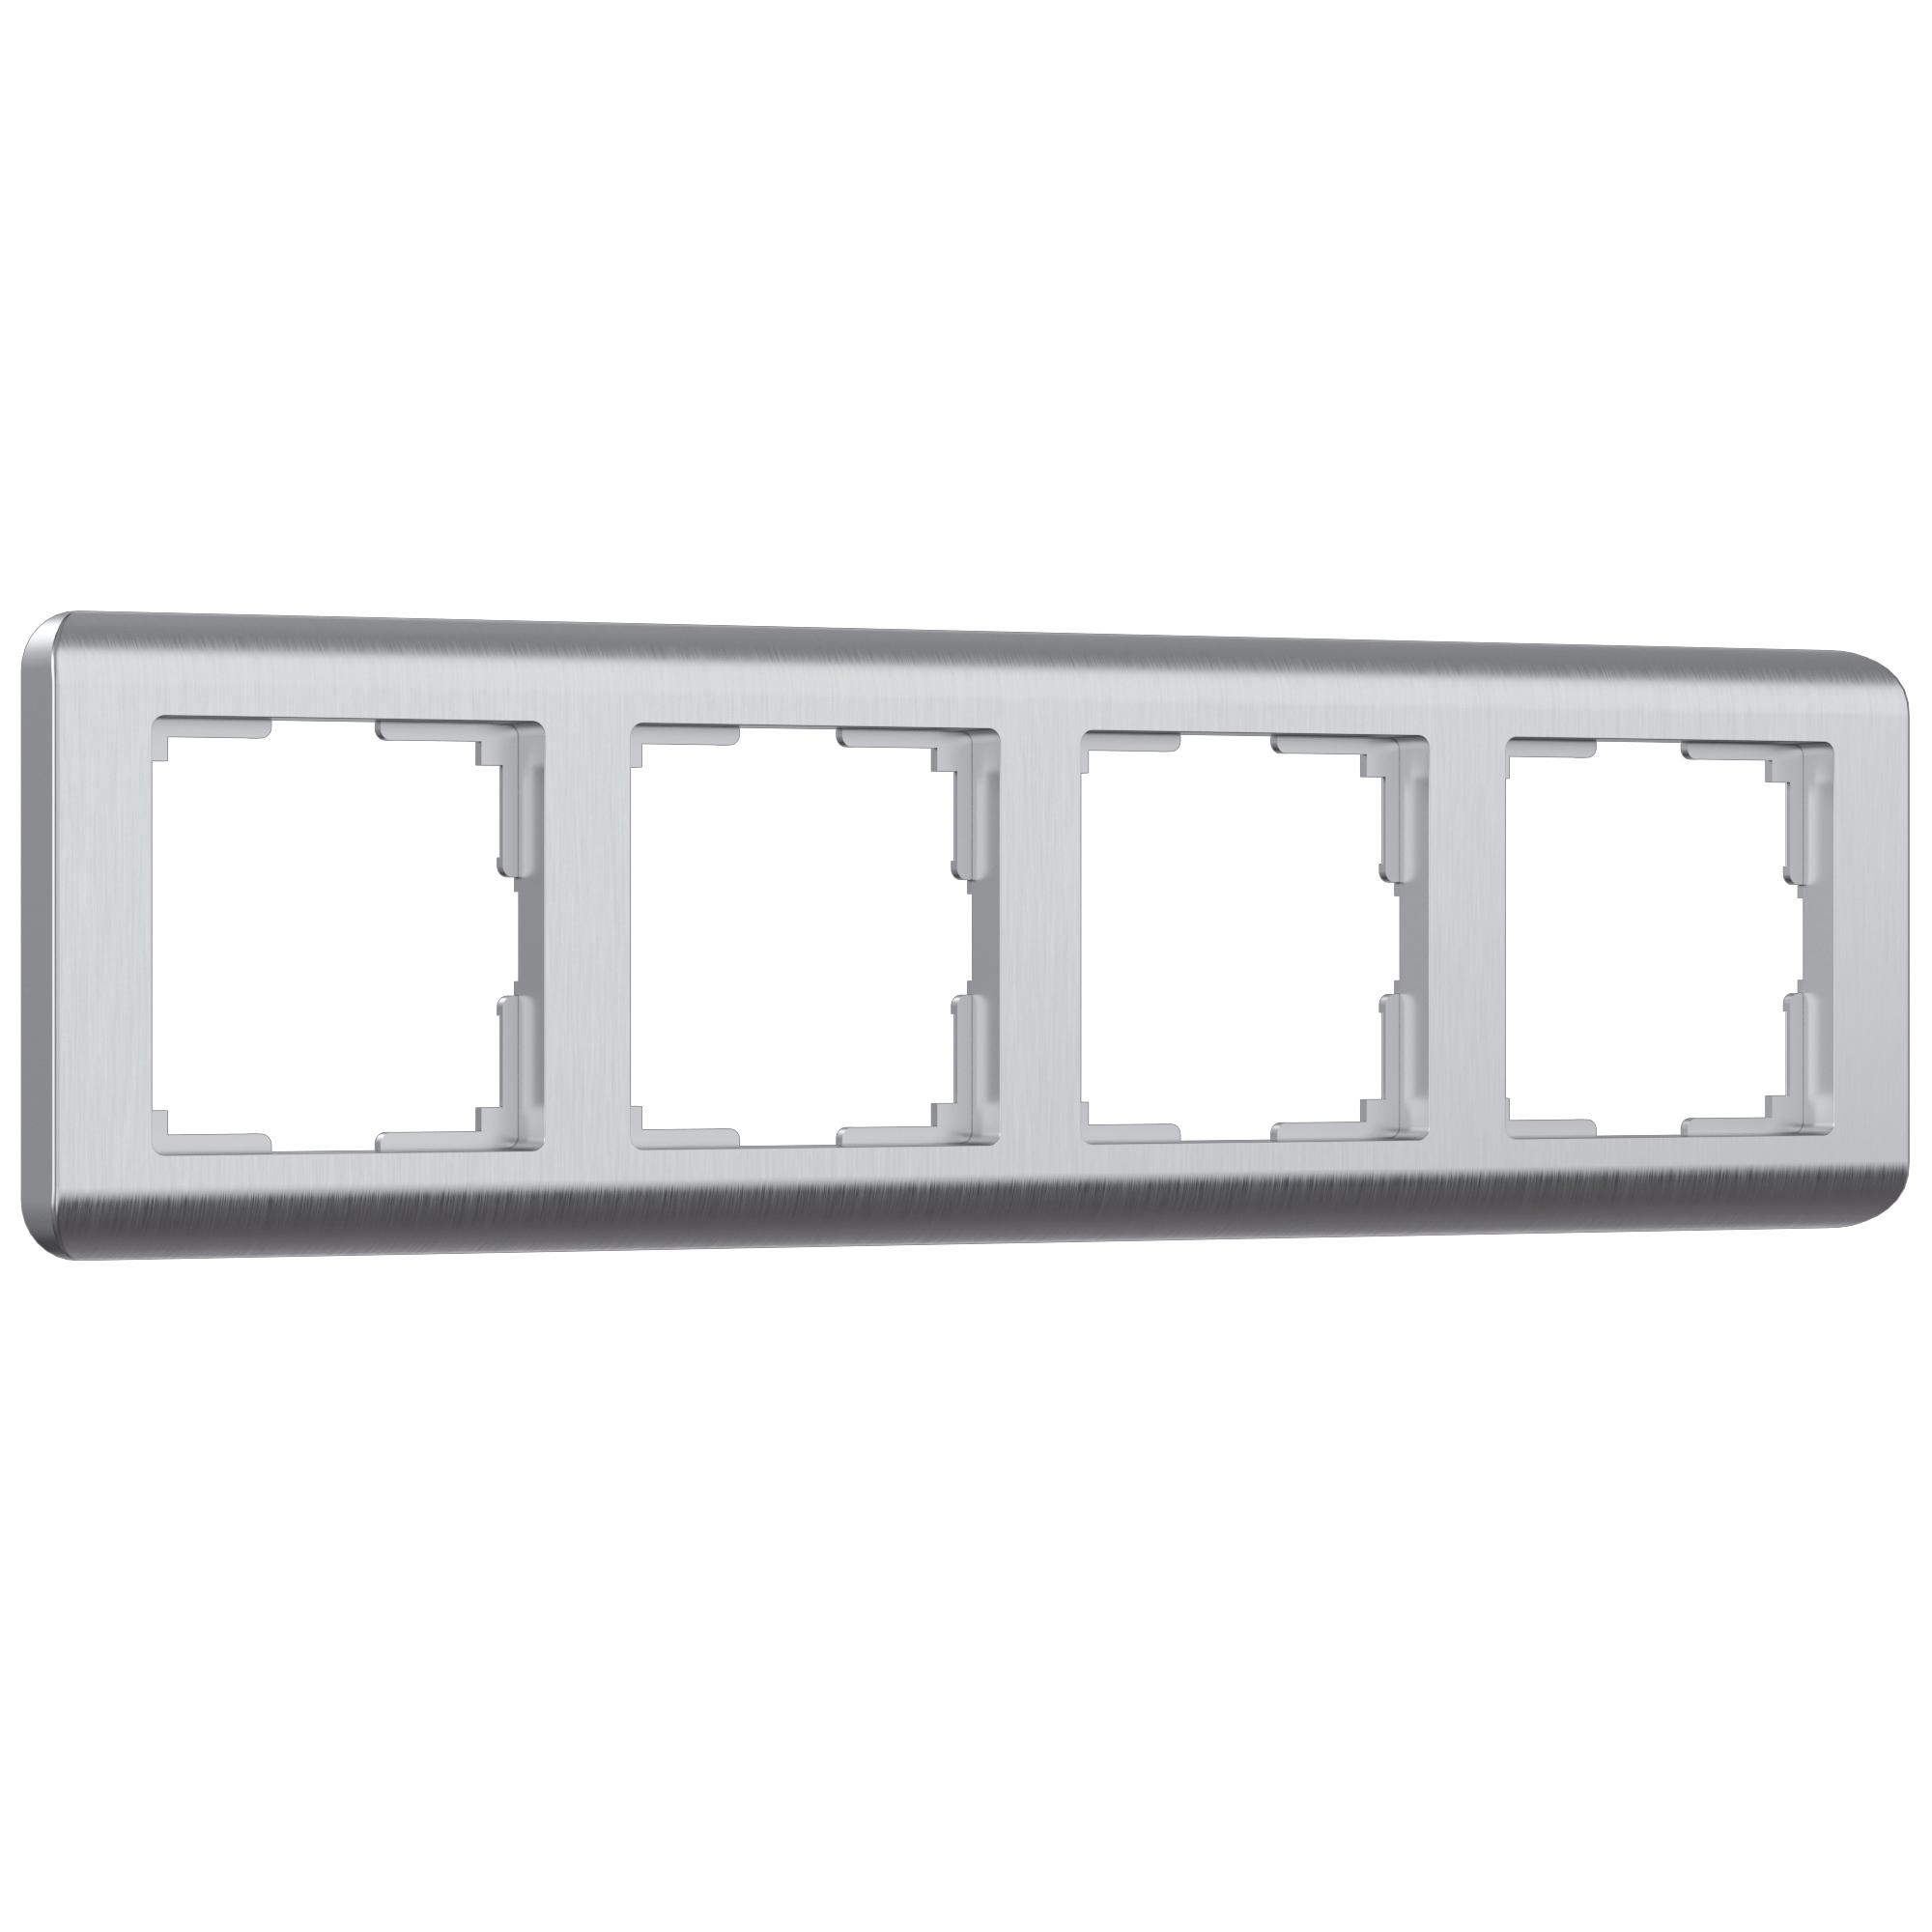 Рамка на 4 поста (серебряный) W0042106